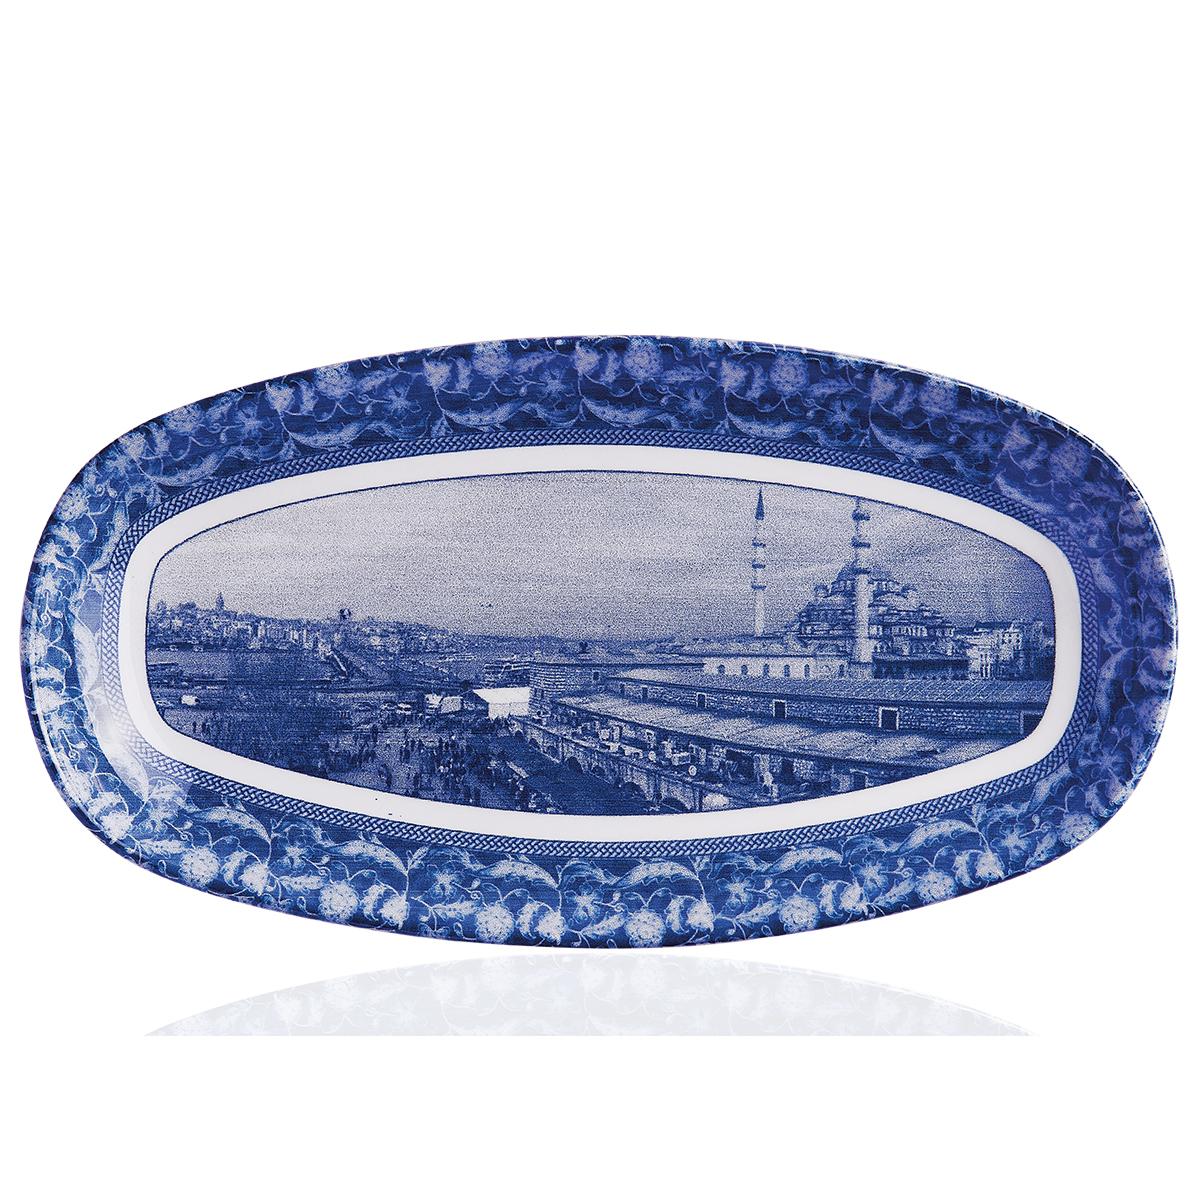 Korkmaz İstanbul Collection Eminönü 28 cm Oval Tabak